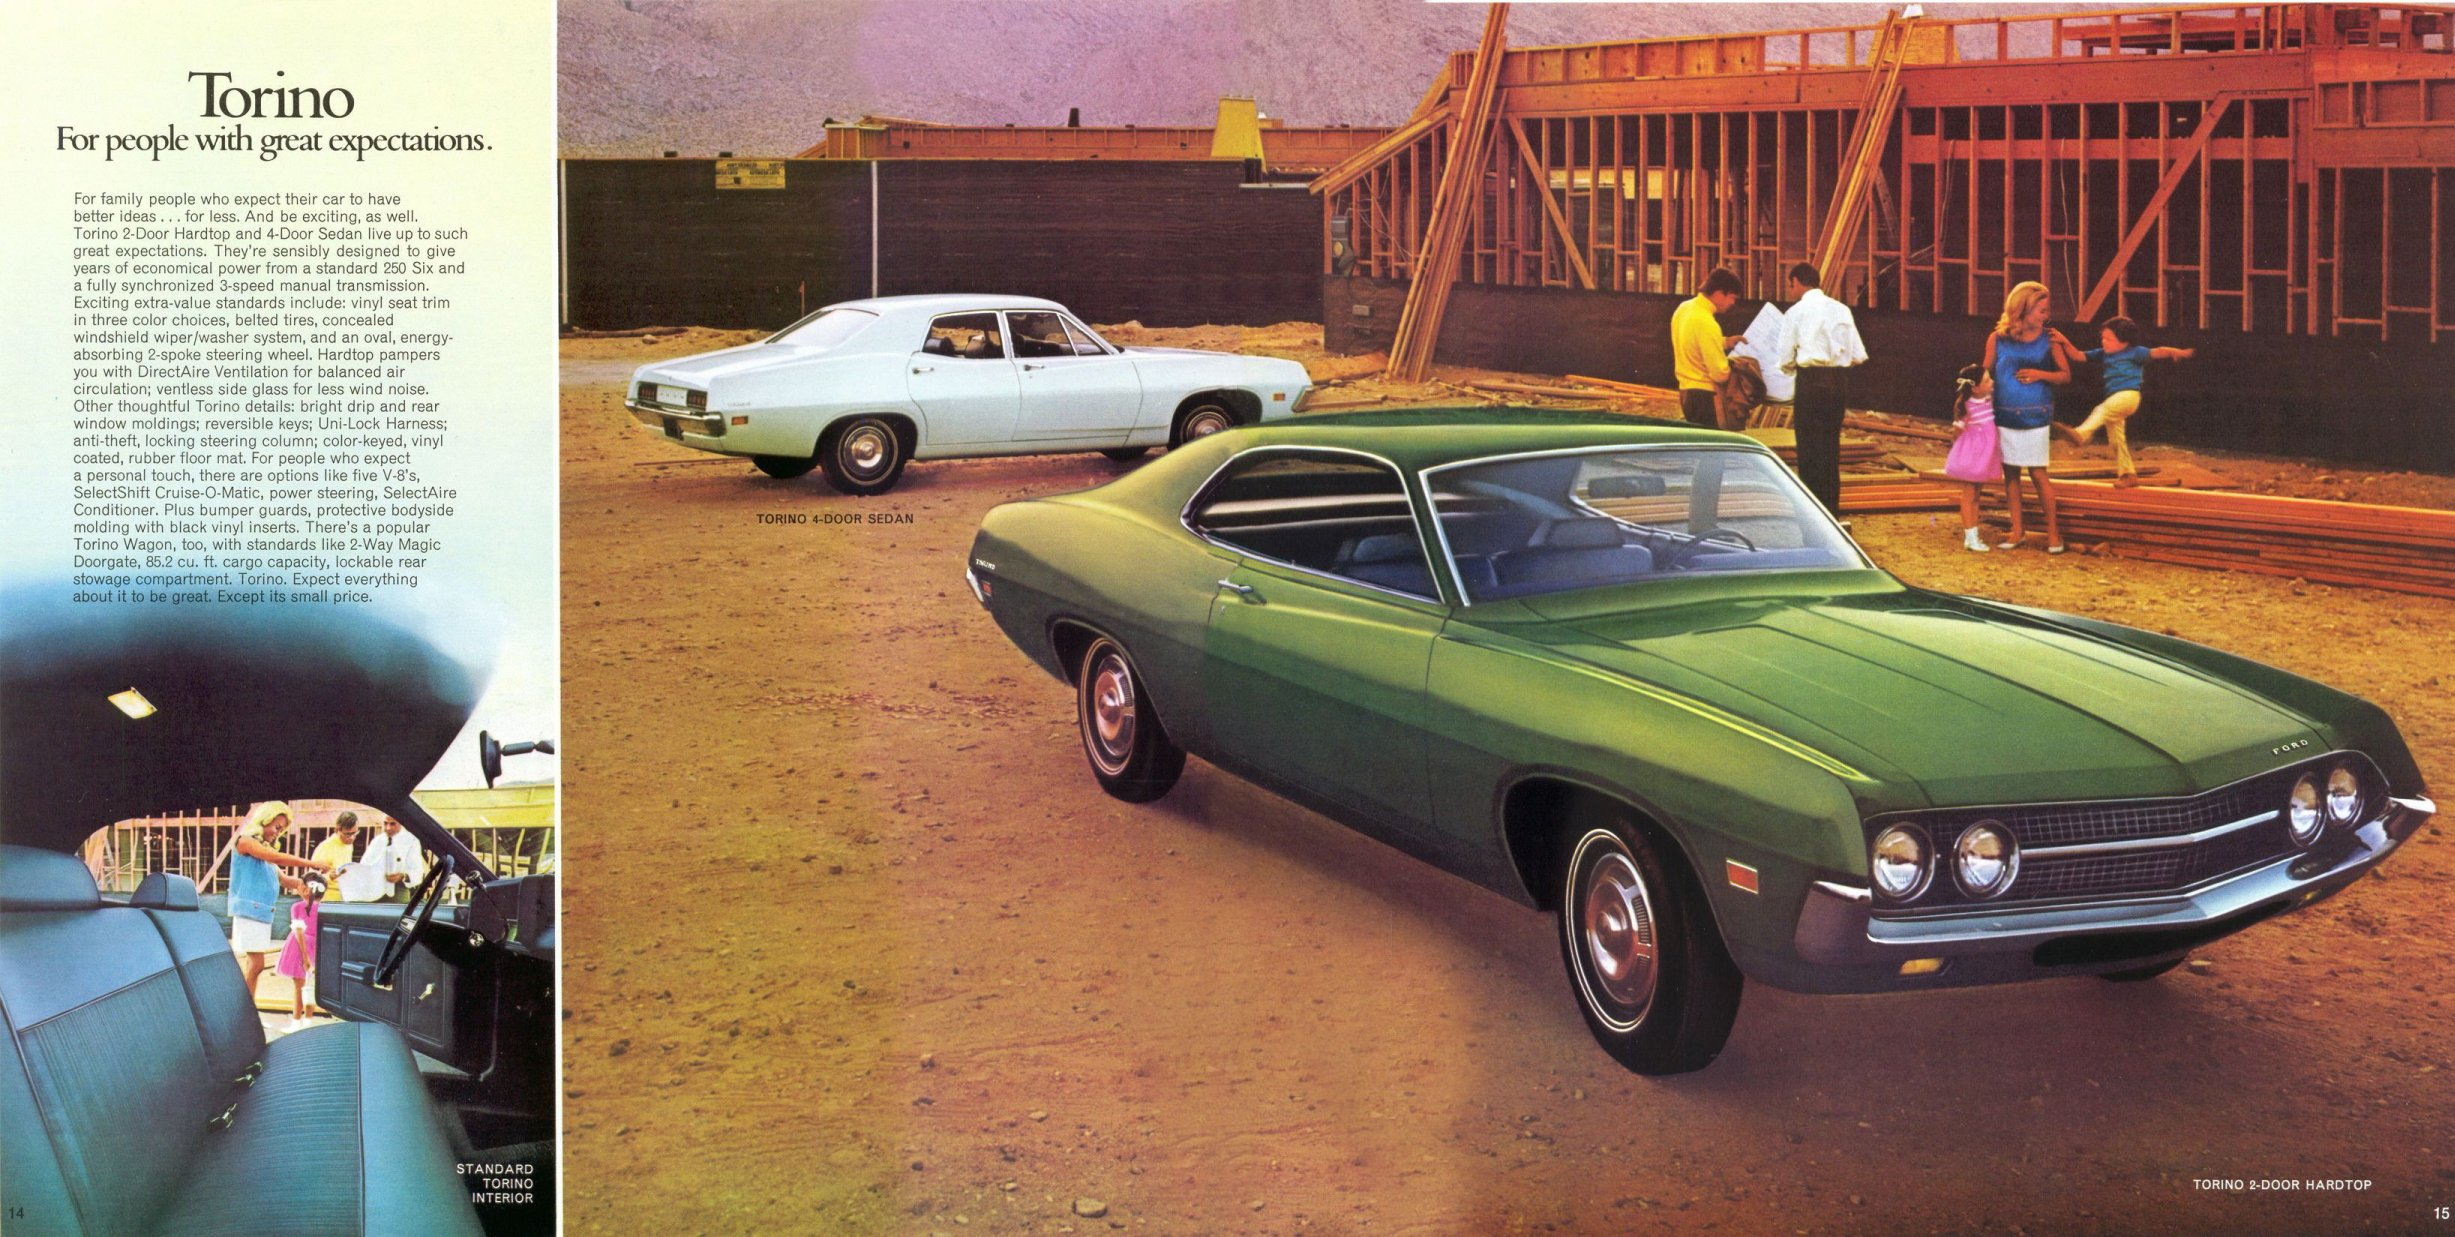 1971 Ford Torino brochure